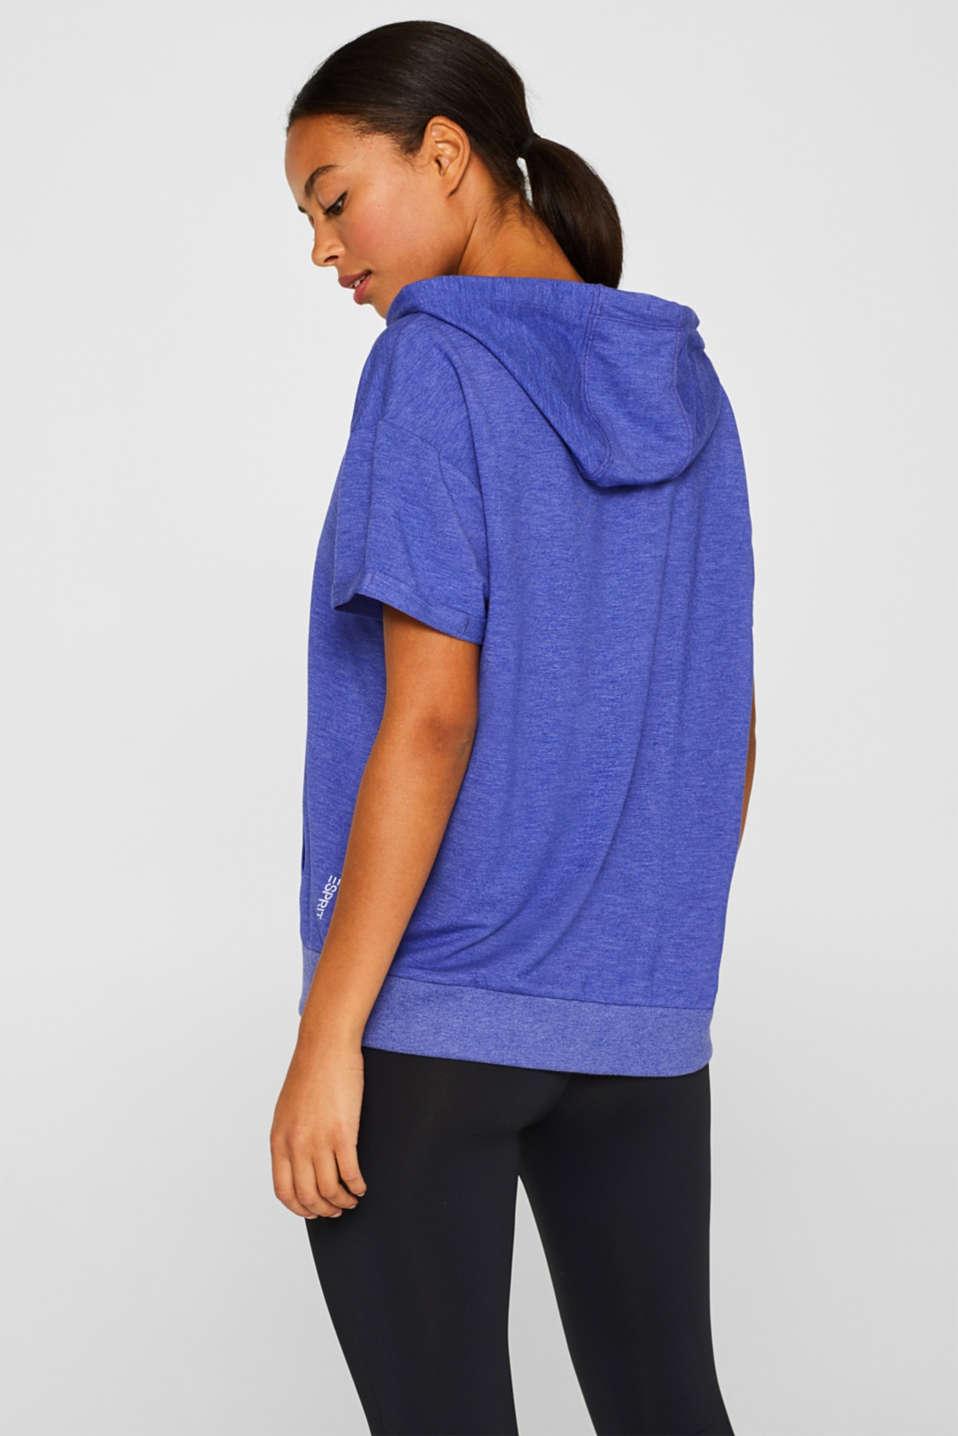 Sweatshirts, BRIGHT BLUE 2, detail image number 3